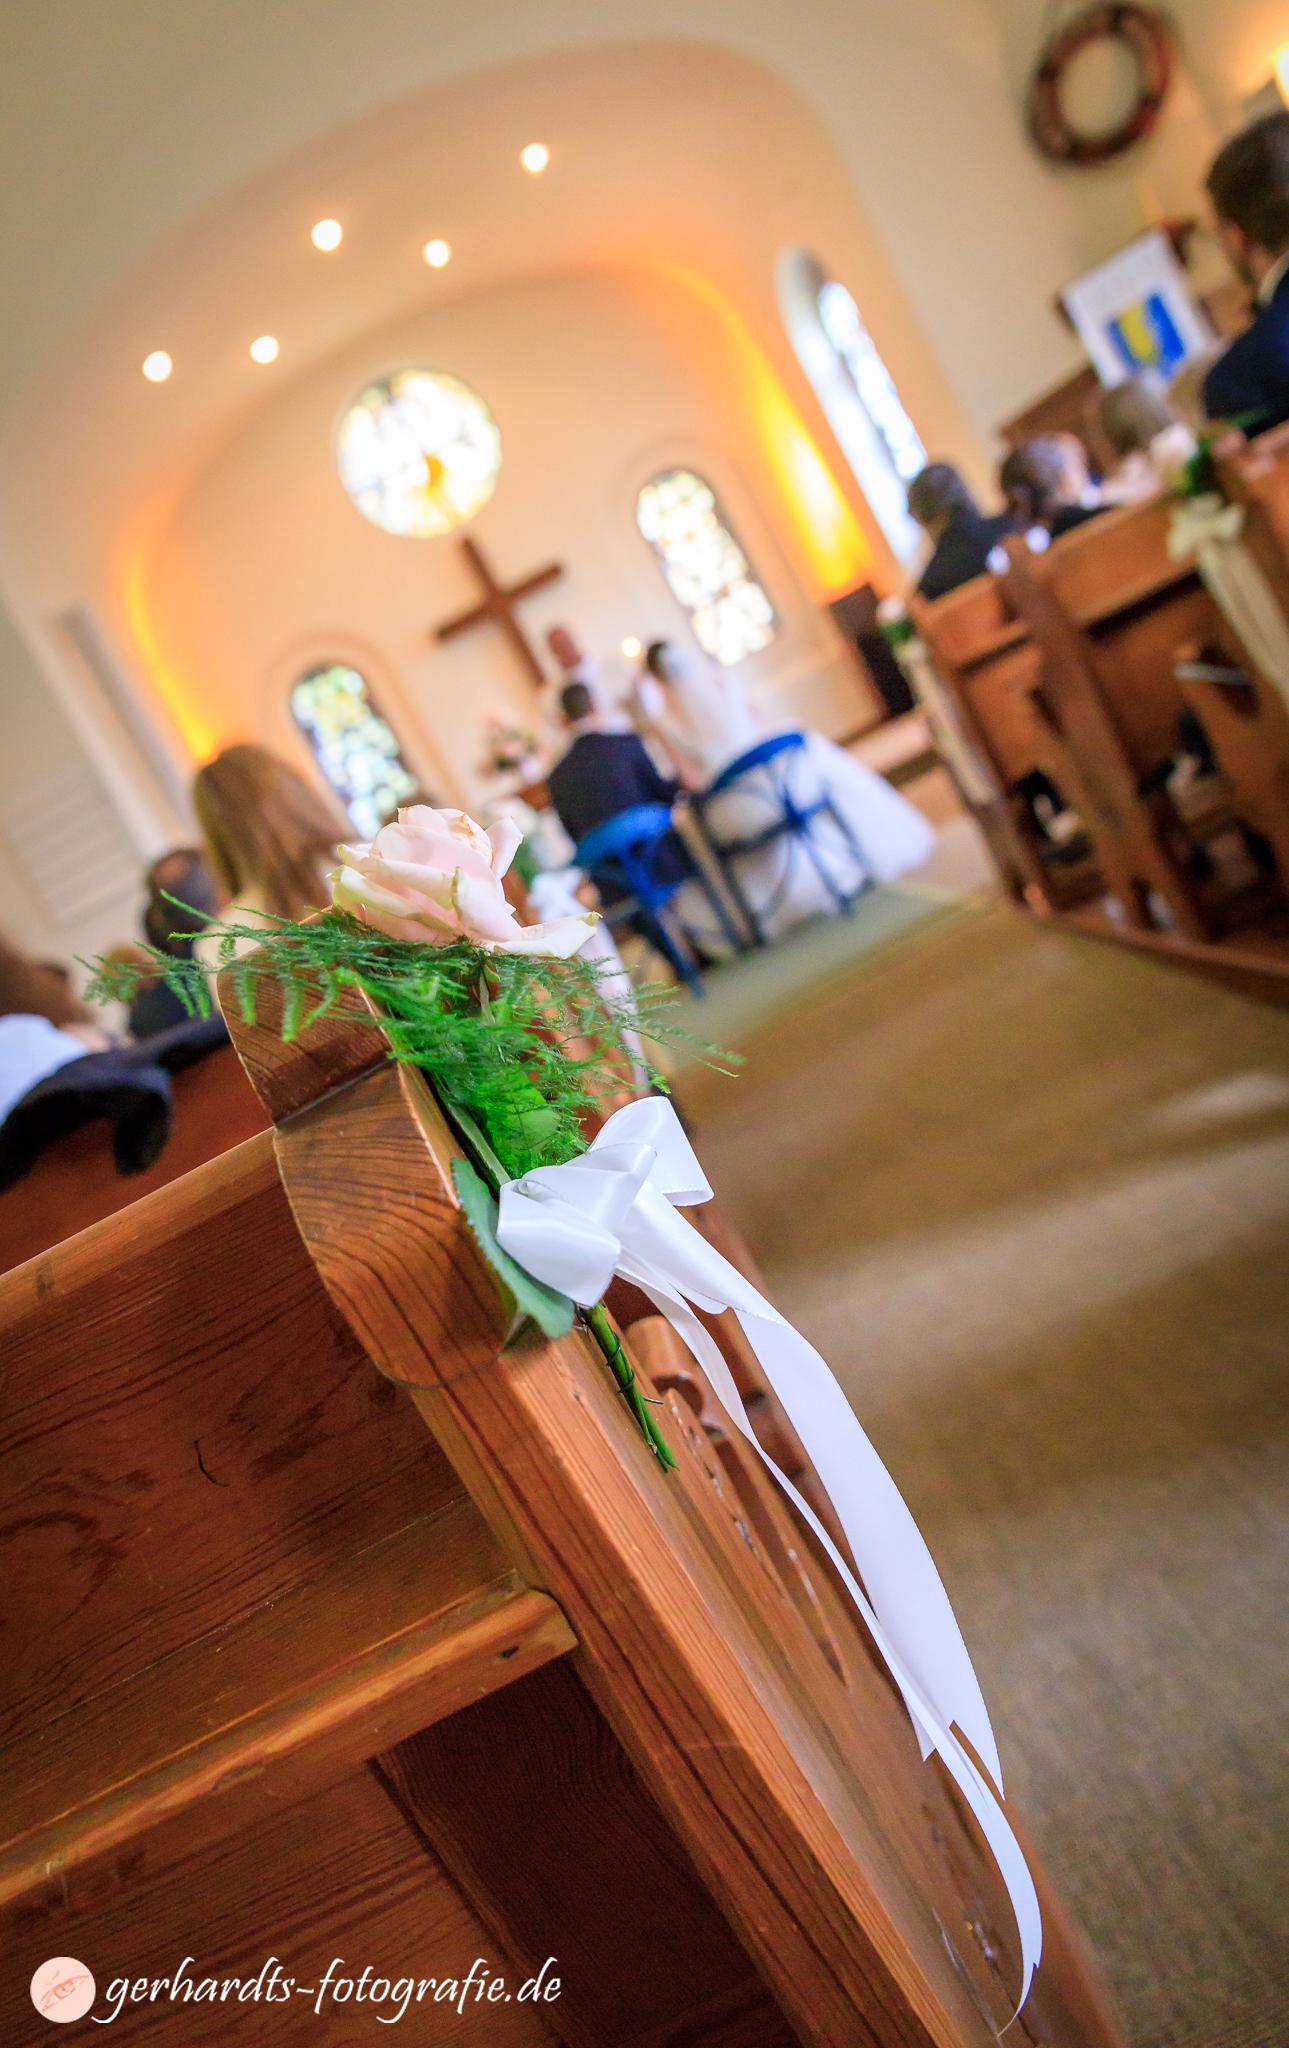 Trauung in der St. Nikolai Kirche Wangerooge - Hochzeitsfotograf Wangerooge